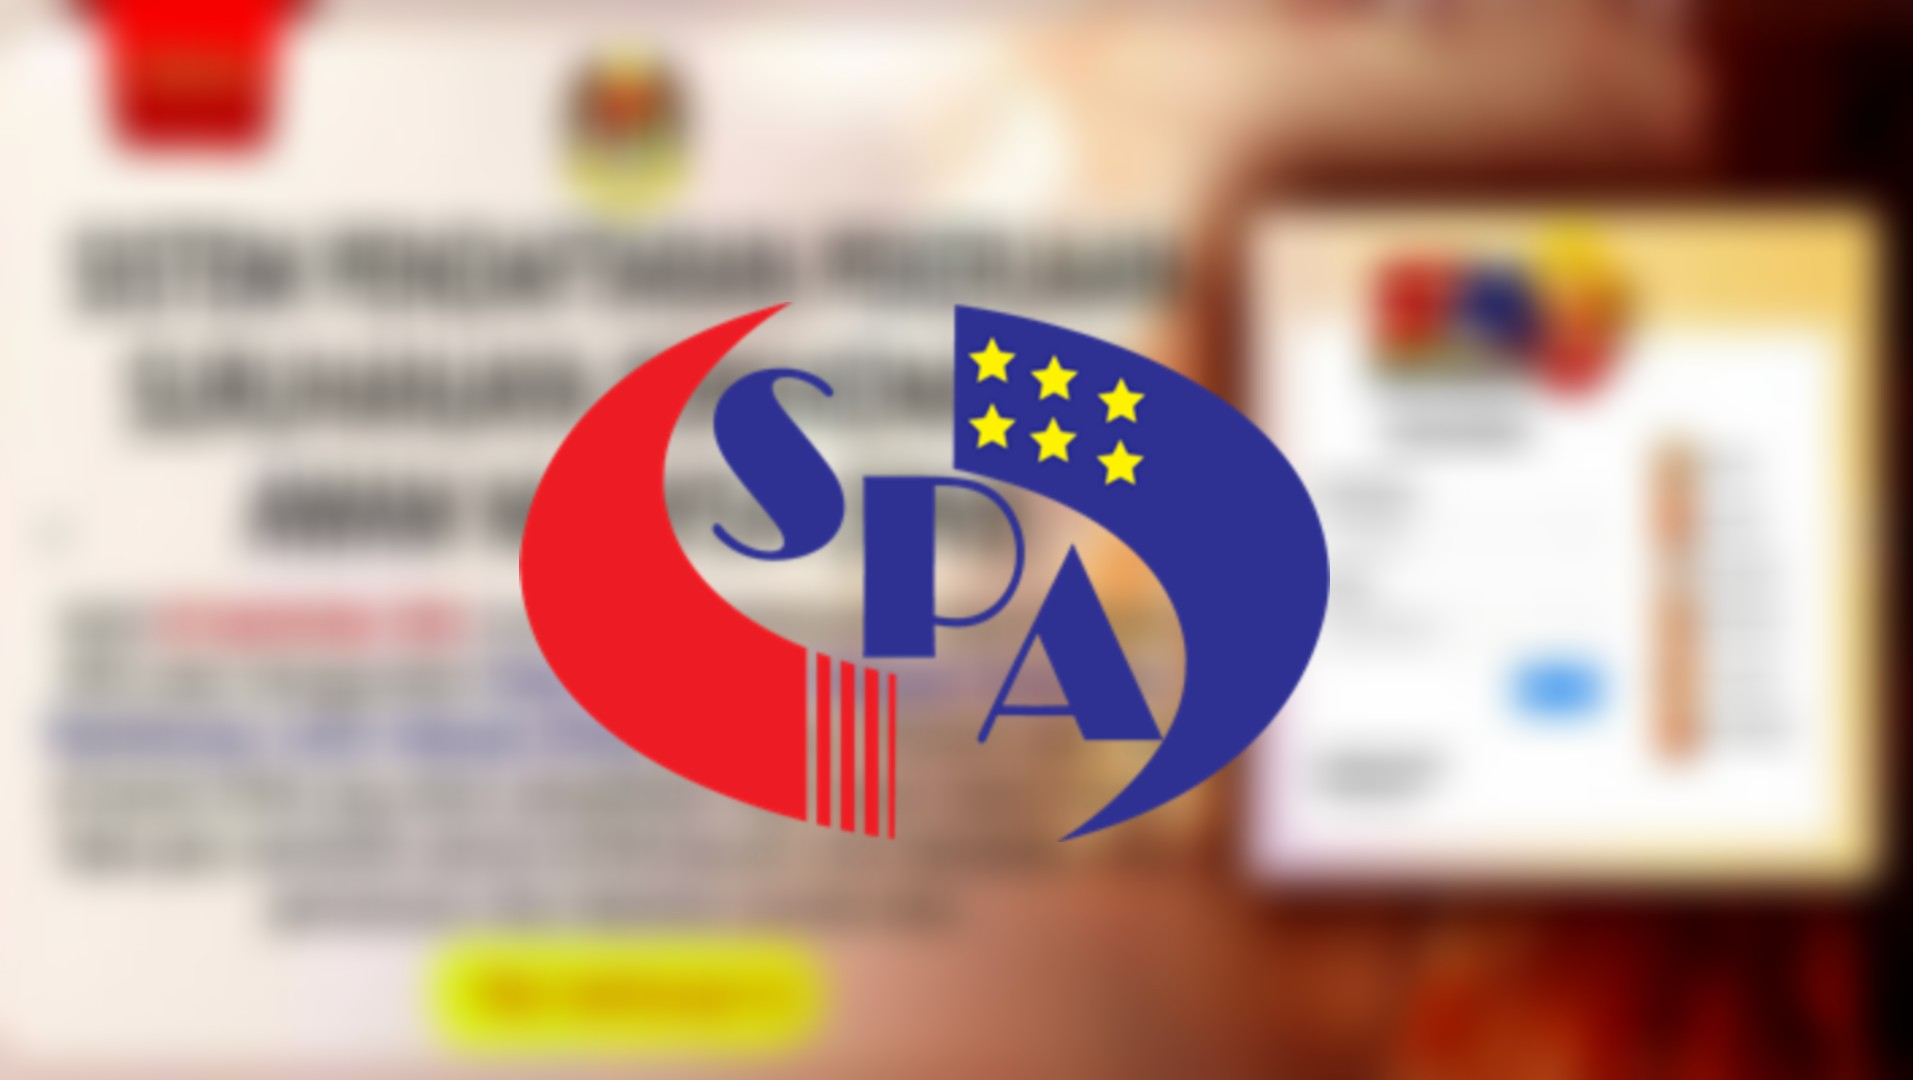 Login SPA9 2020: Permohonan dan Kemaskini Online